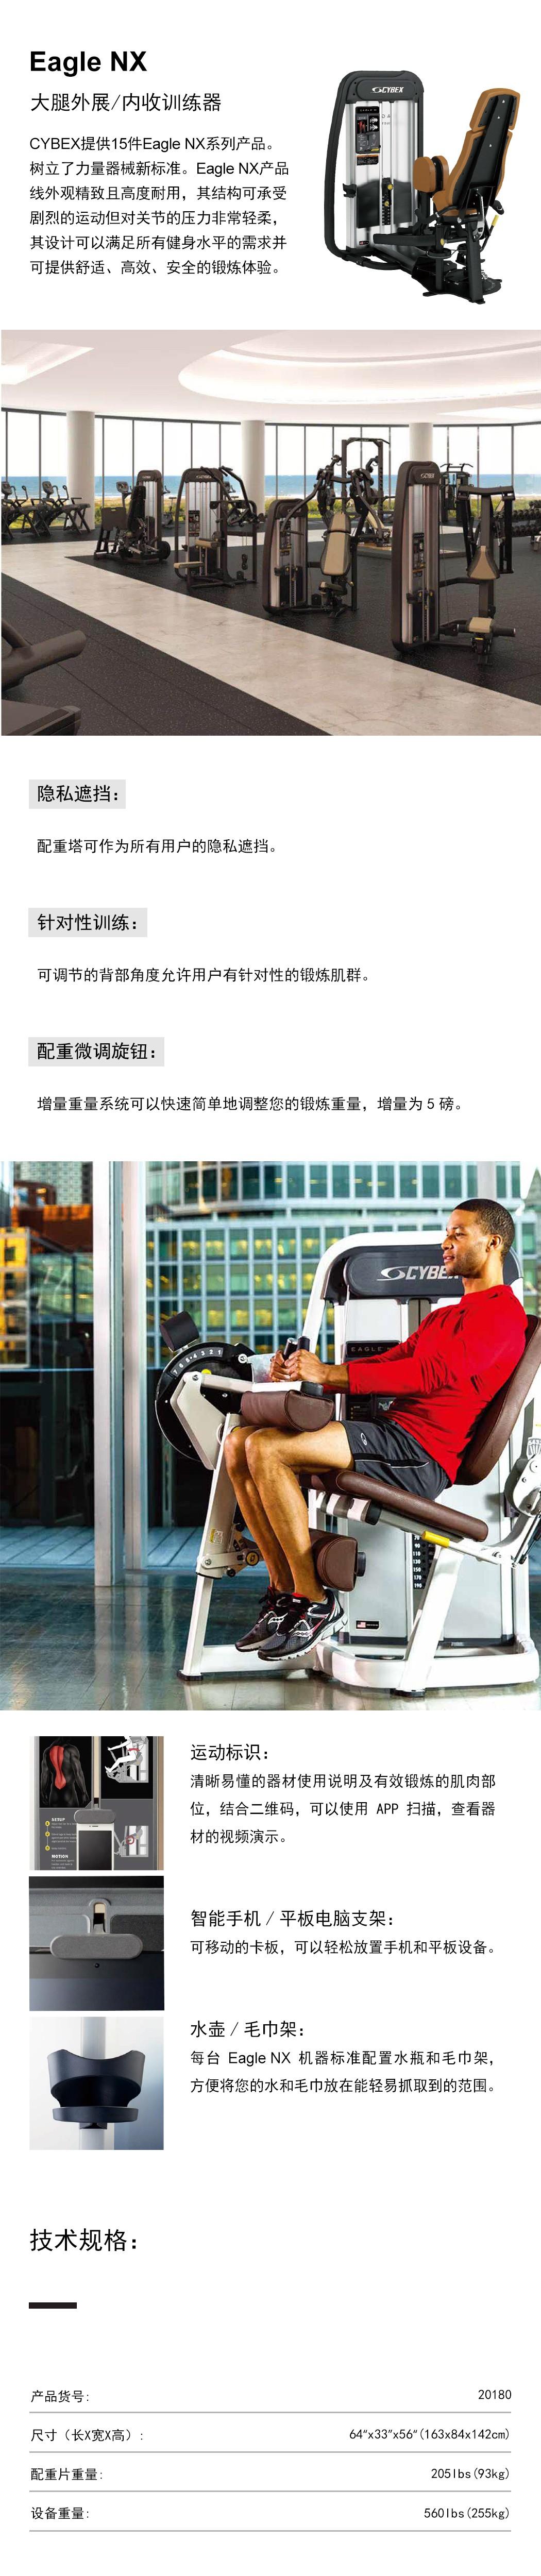 cybex-大腿外展内收训练器.jpg